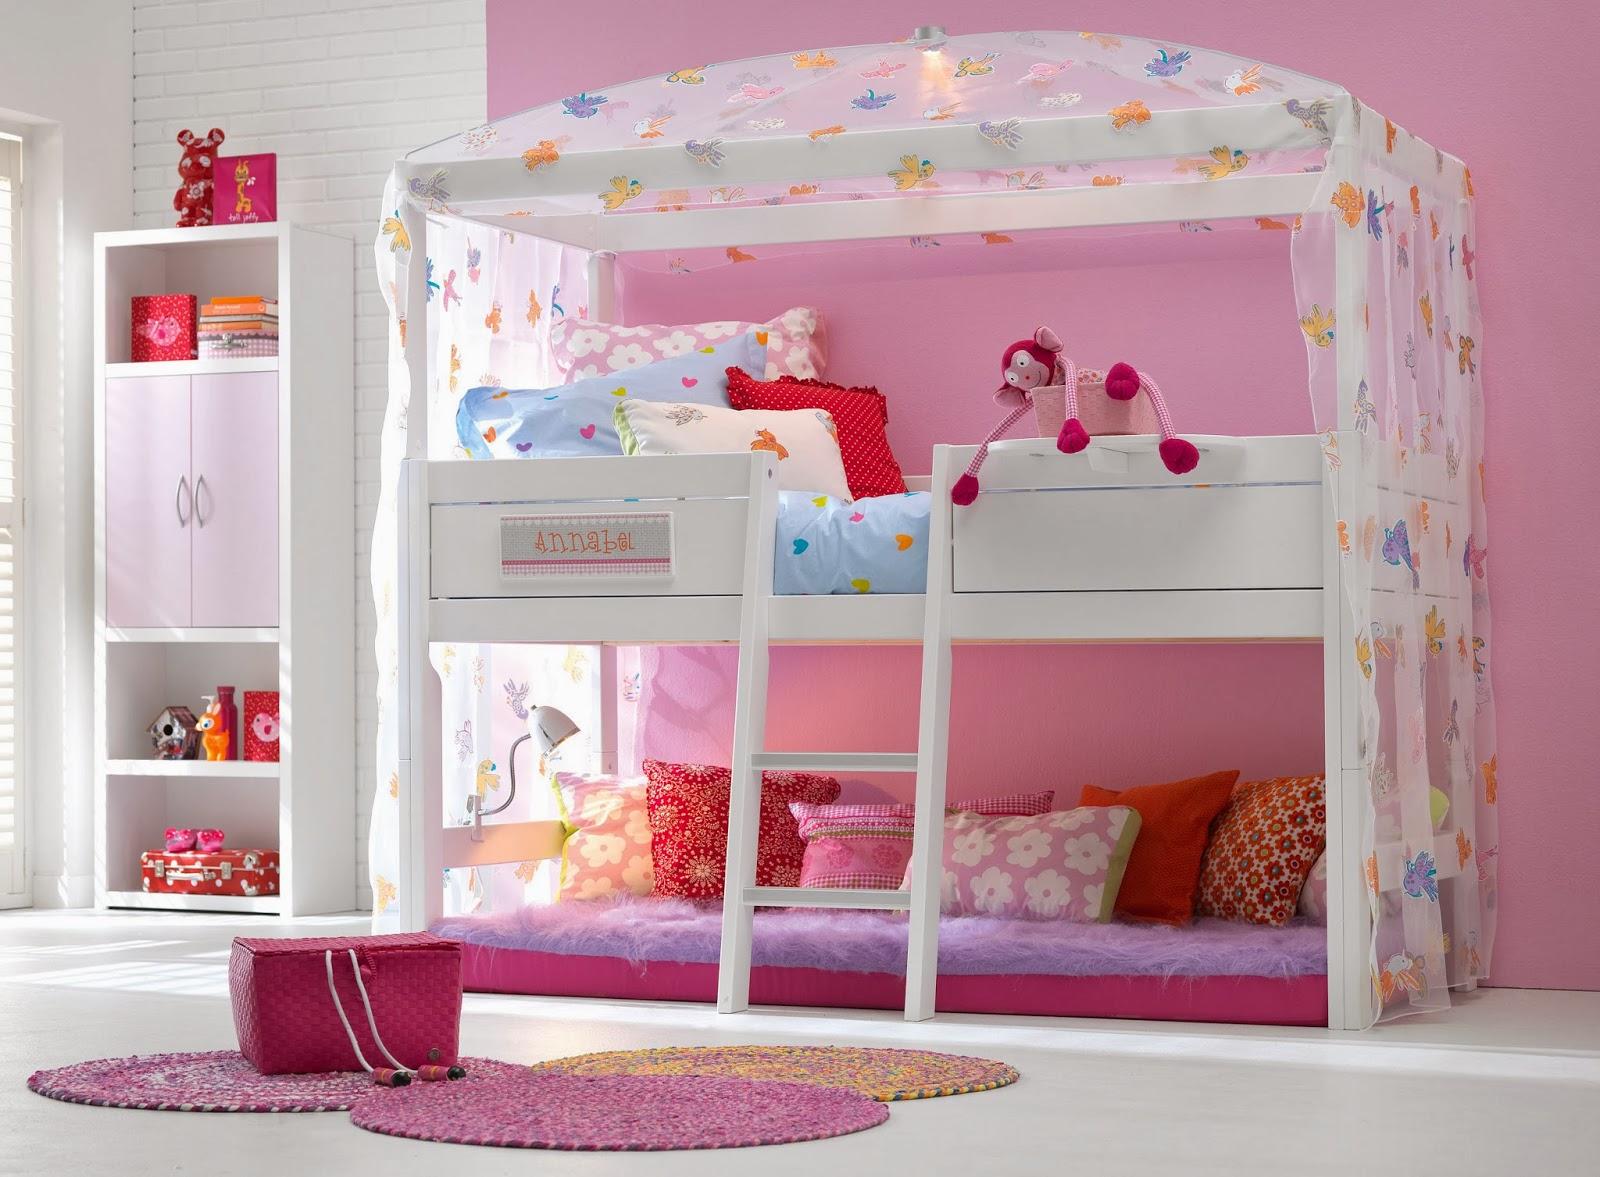 http://www.portobellostreet.es/mueble/27856/Dormitorio-Infantil-Free-Bird